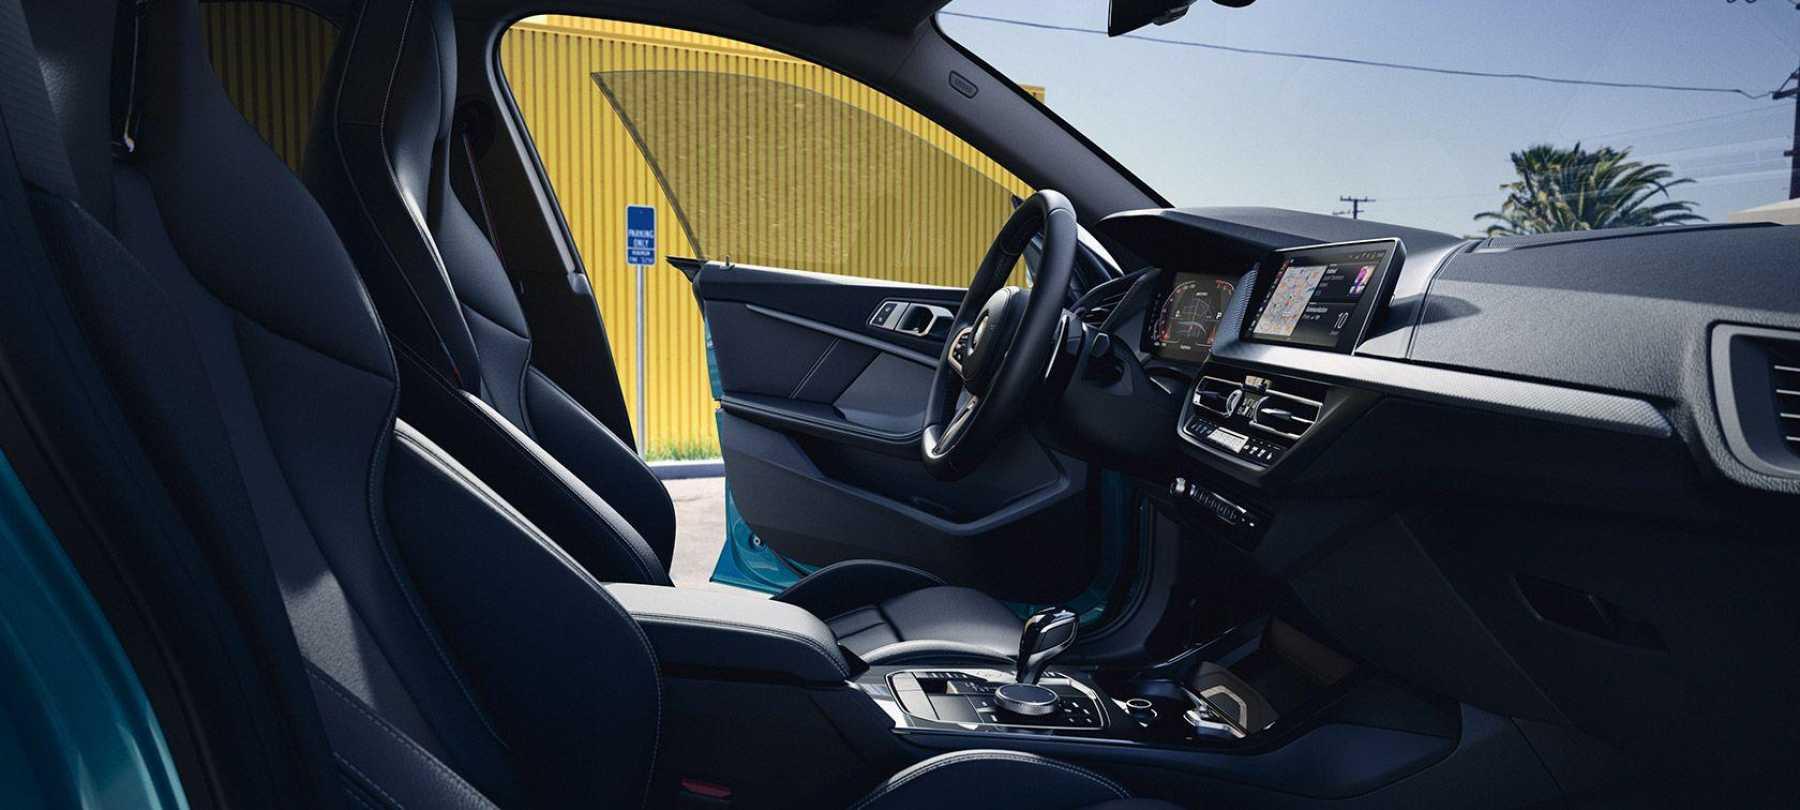 New 2 Series Gran Coupe interior